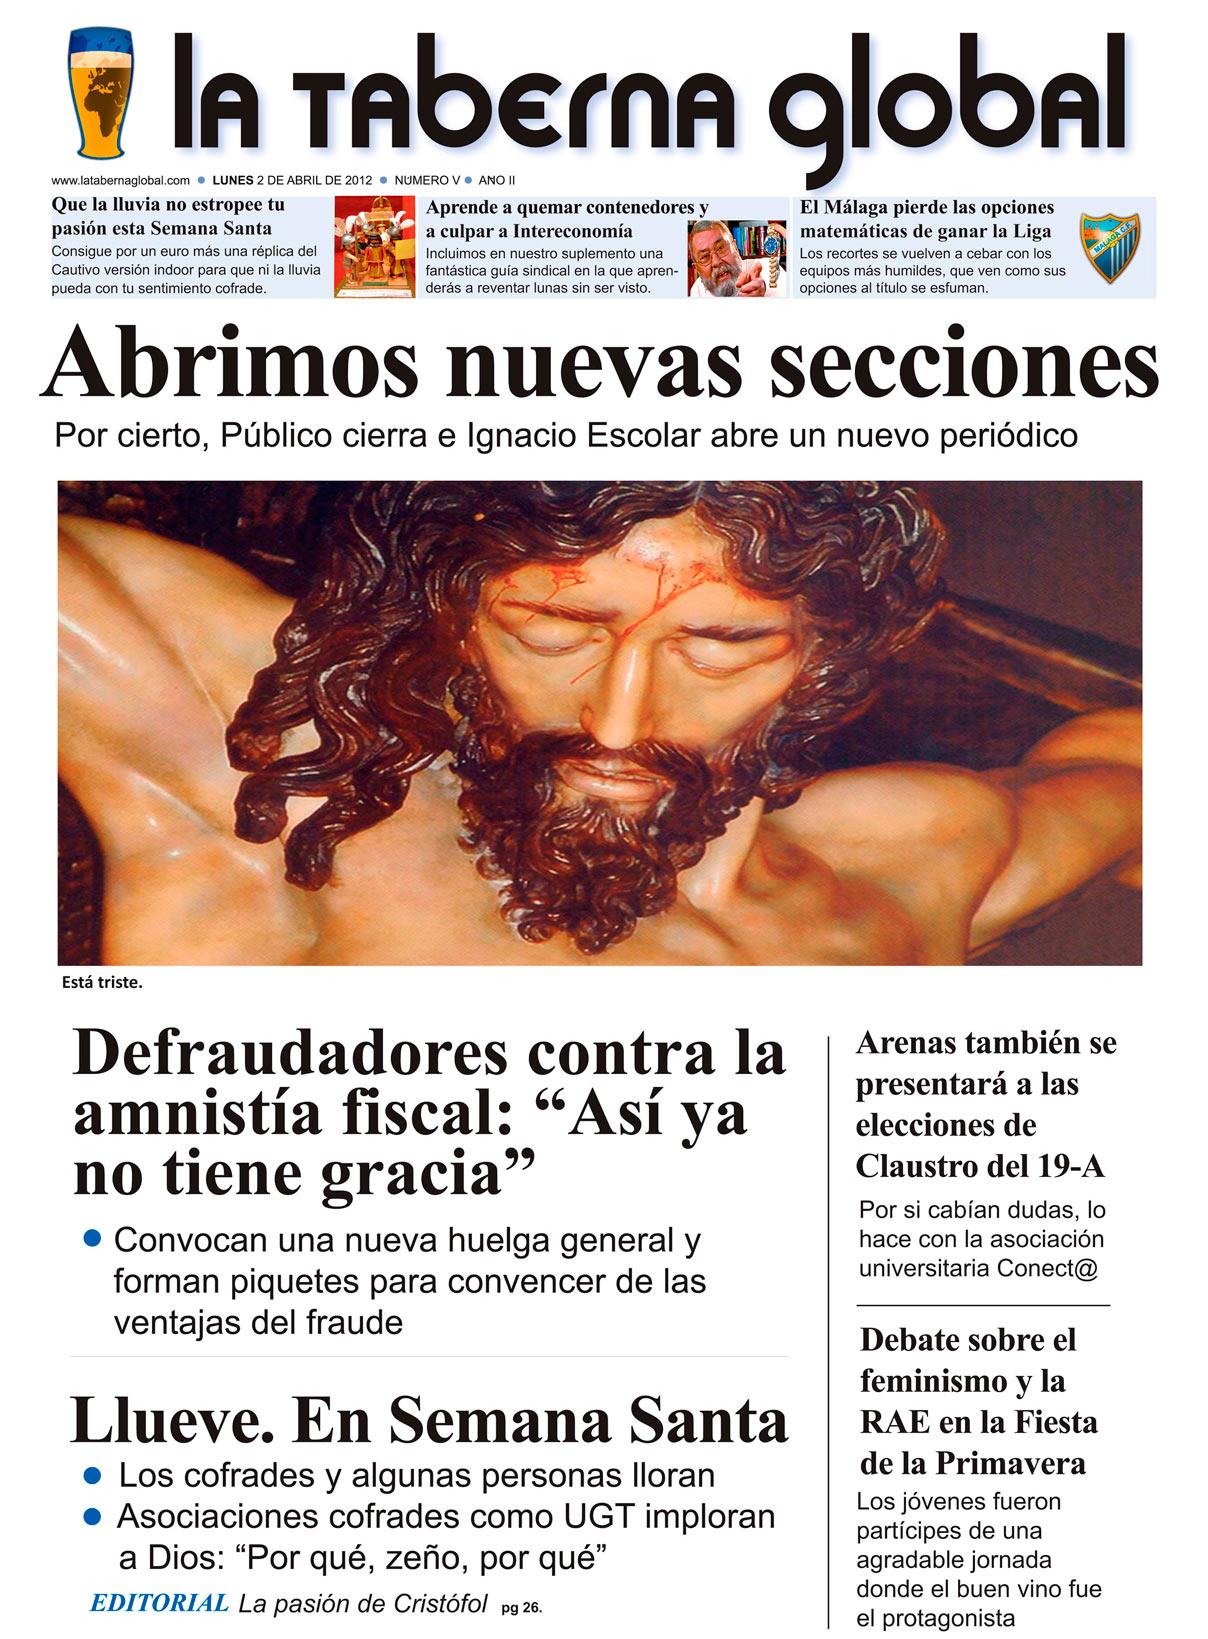 La portada satírica de LTG 02/04/12